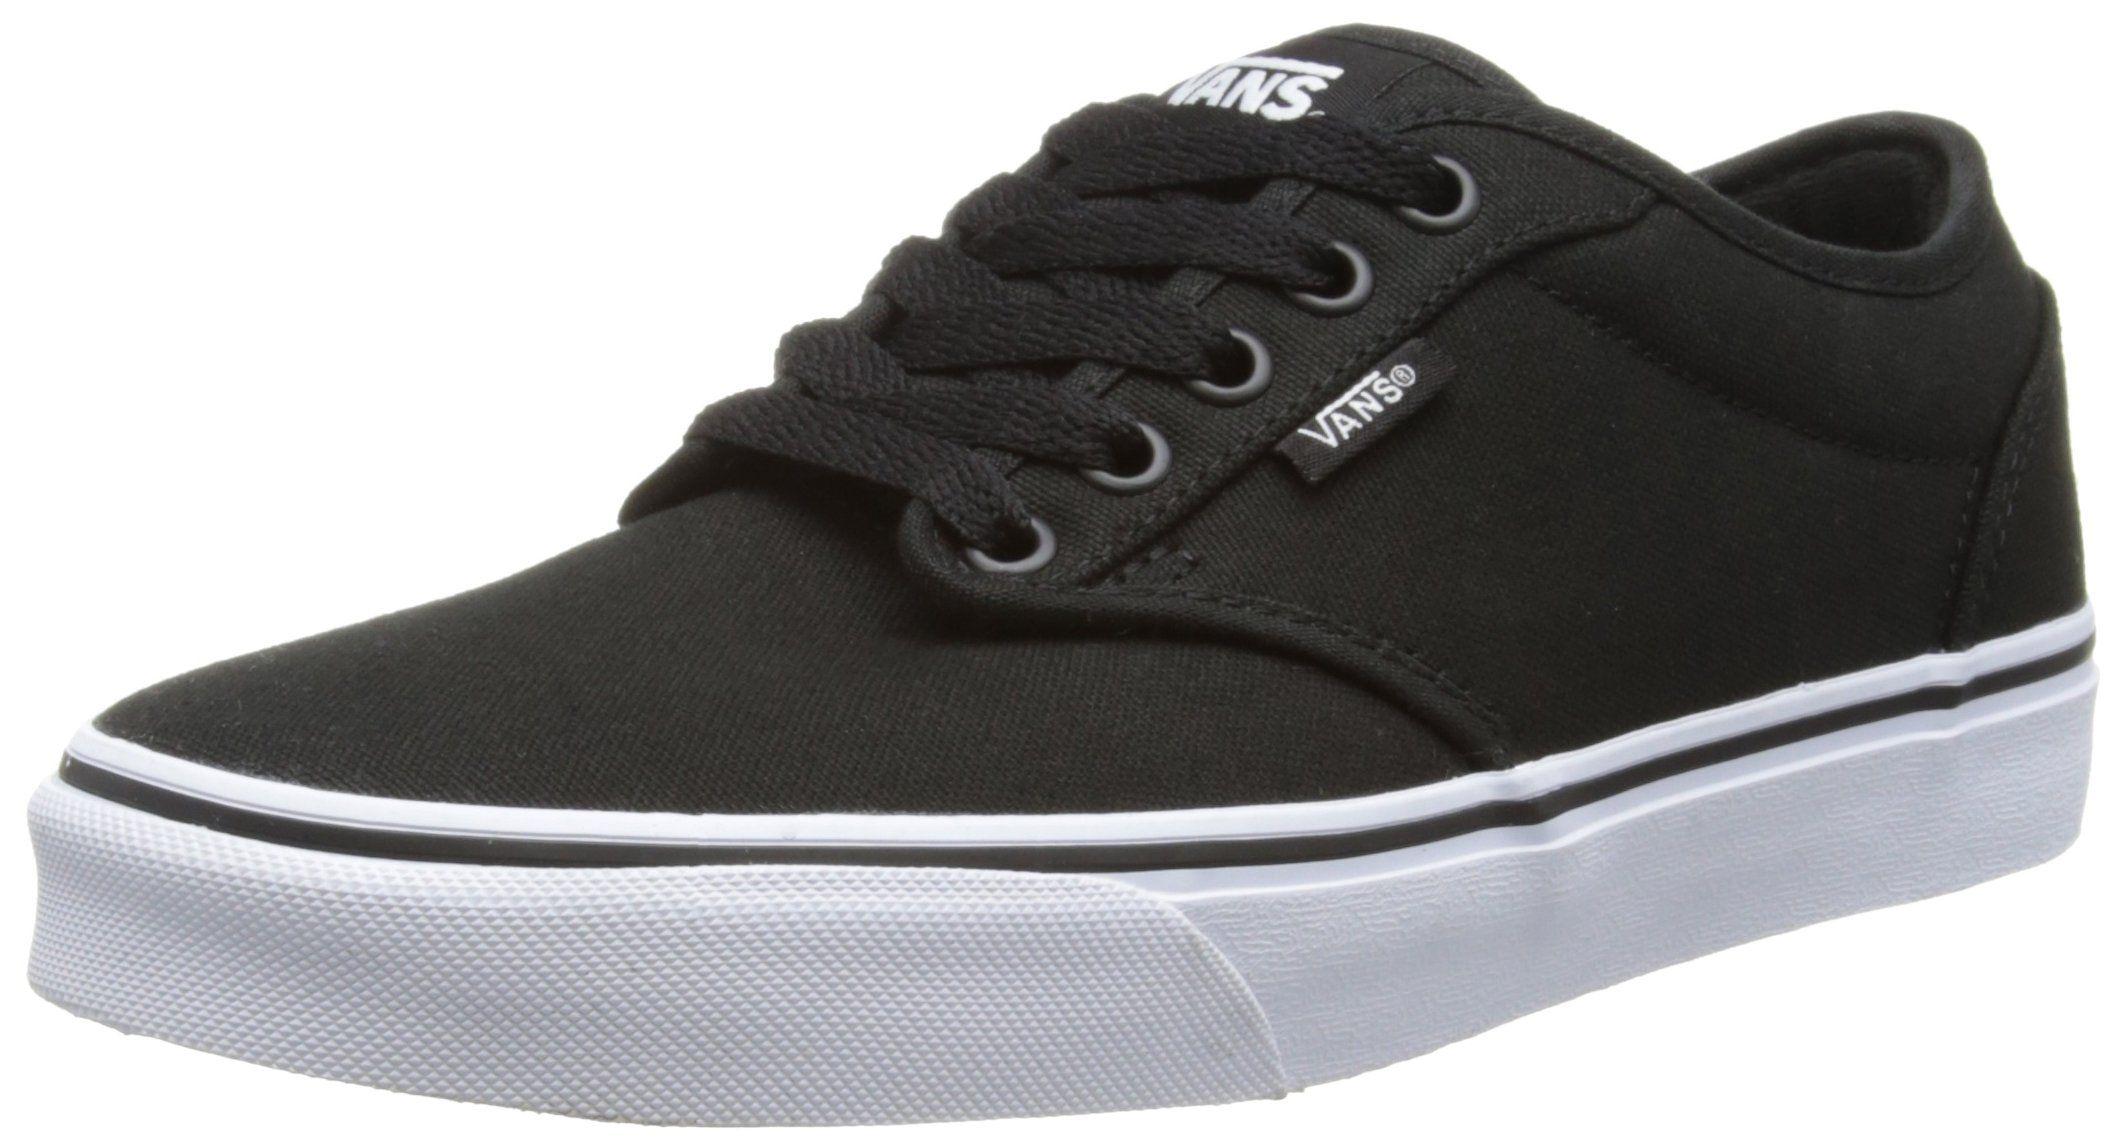 UK Online - Vans M ATWOOD BUCK Sneakers man Basses